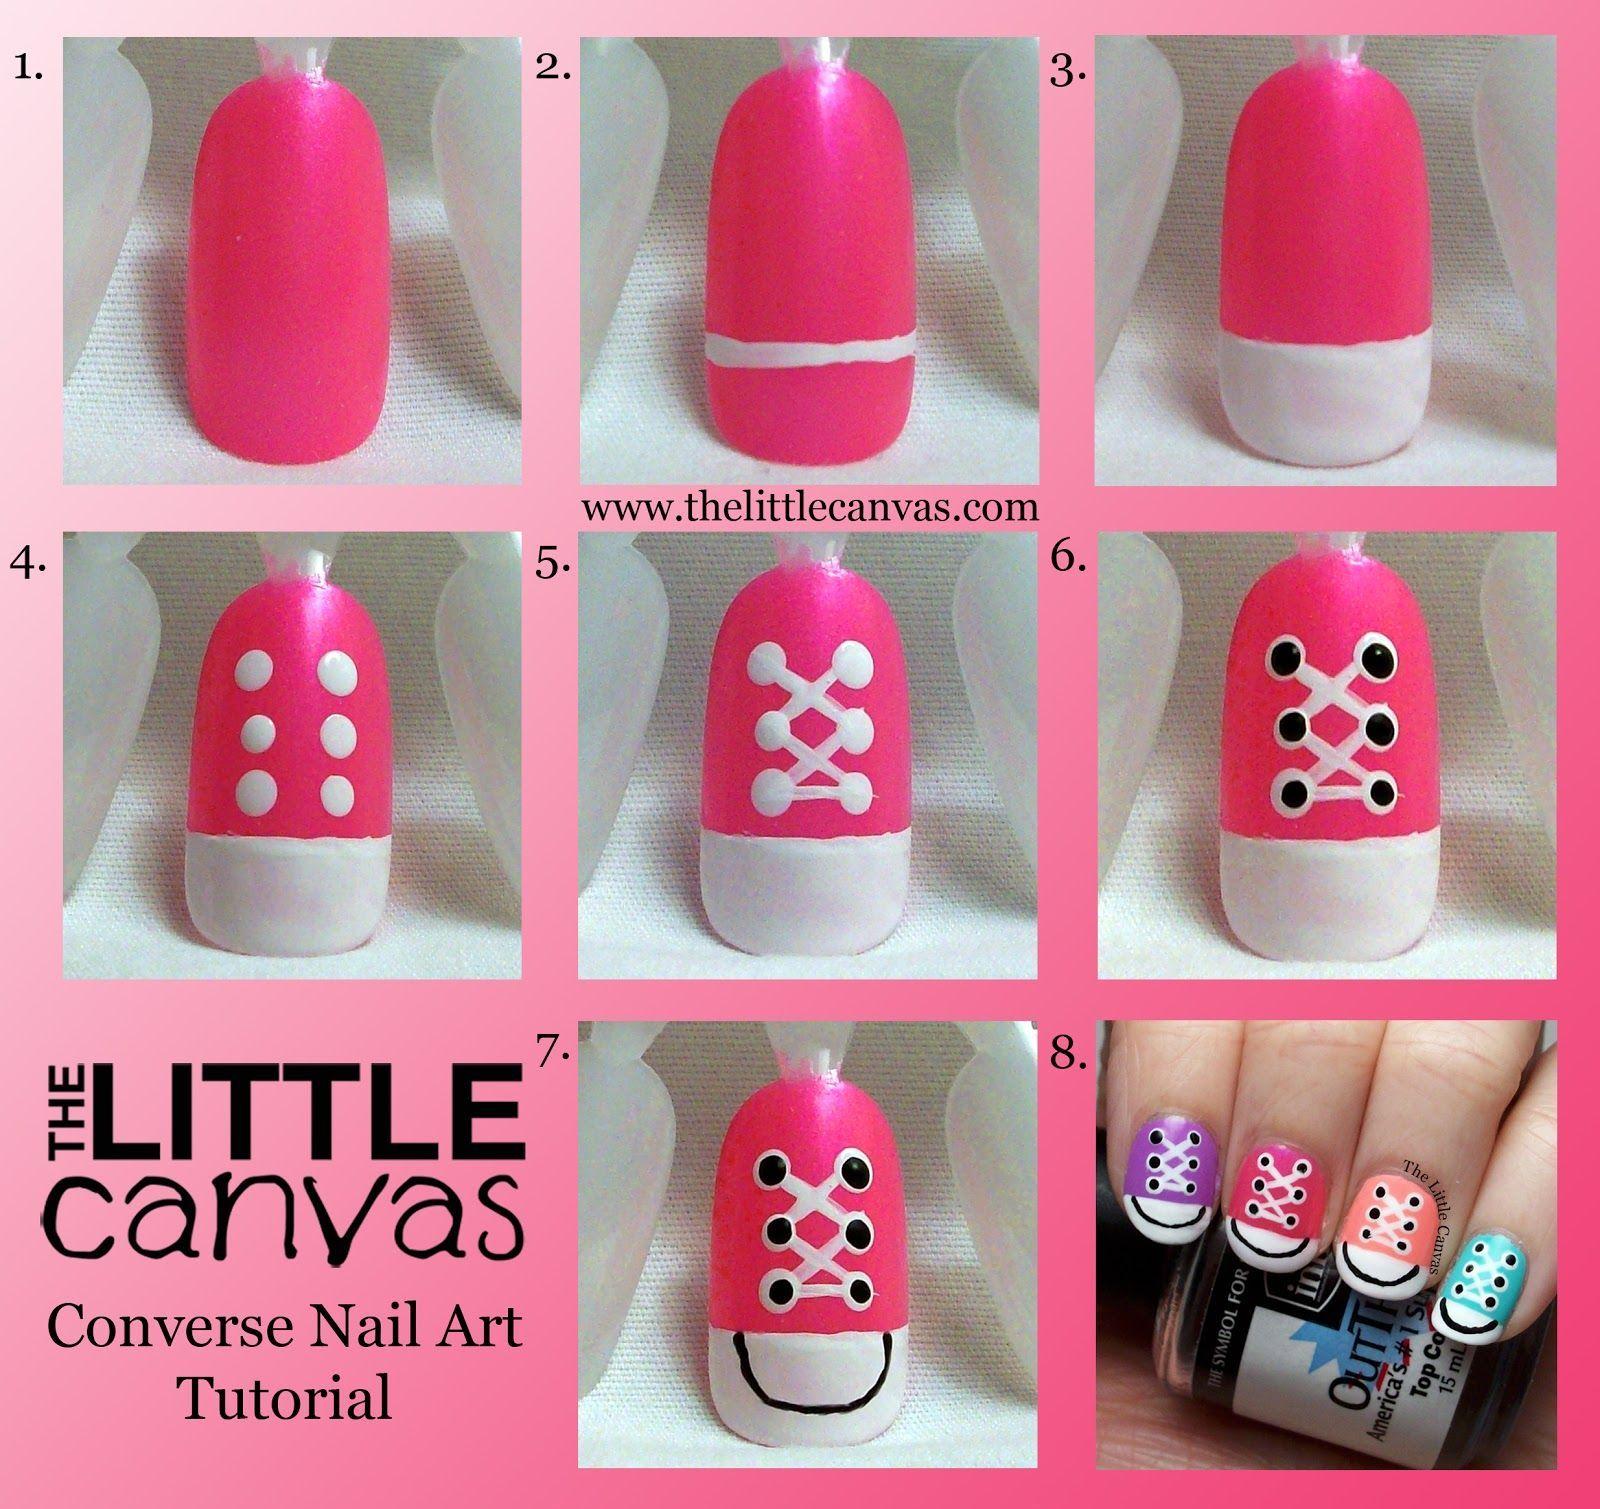 Converse Nail Art Take 2   Tutorial! #converse #nail art diy for beginners #tutorial